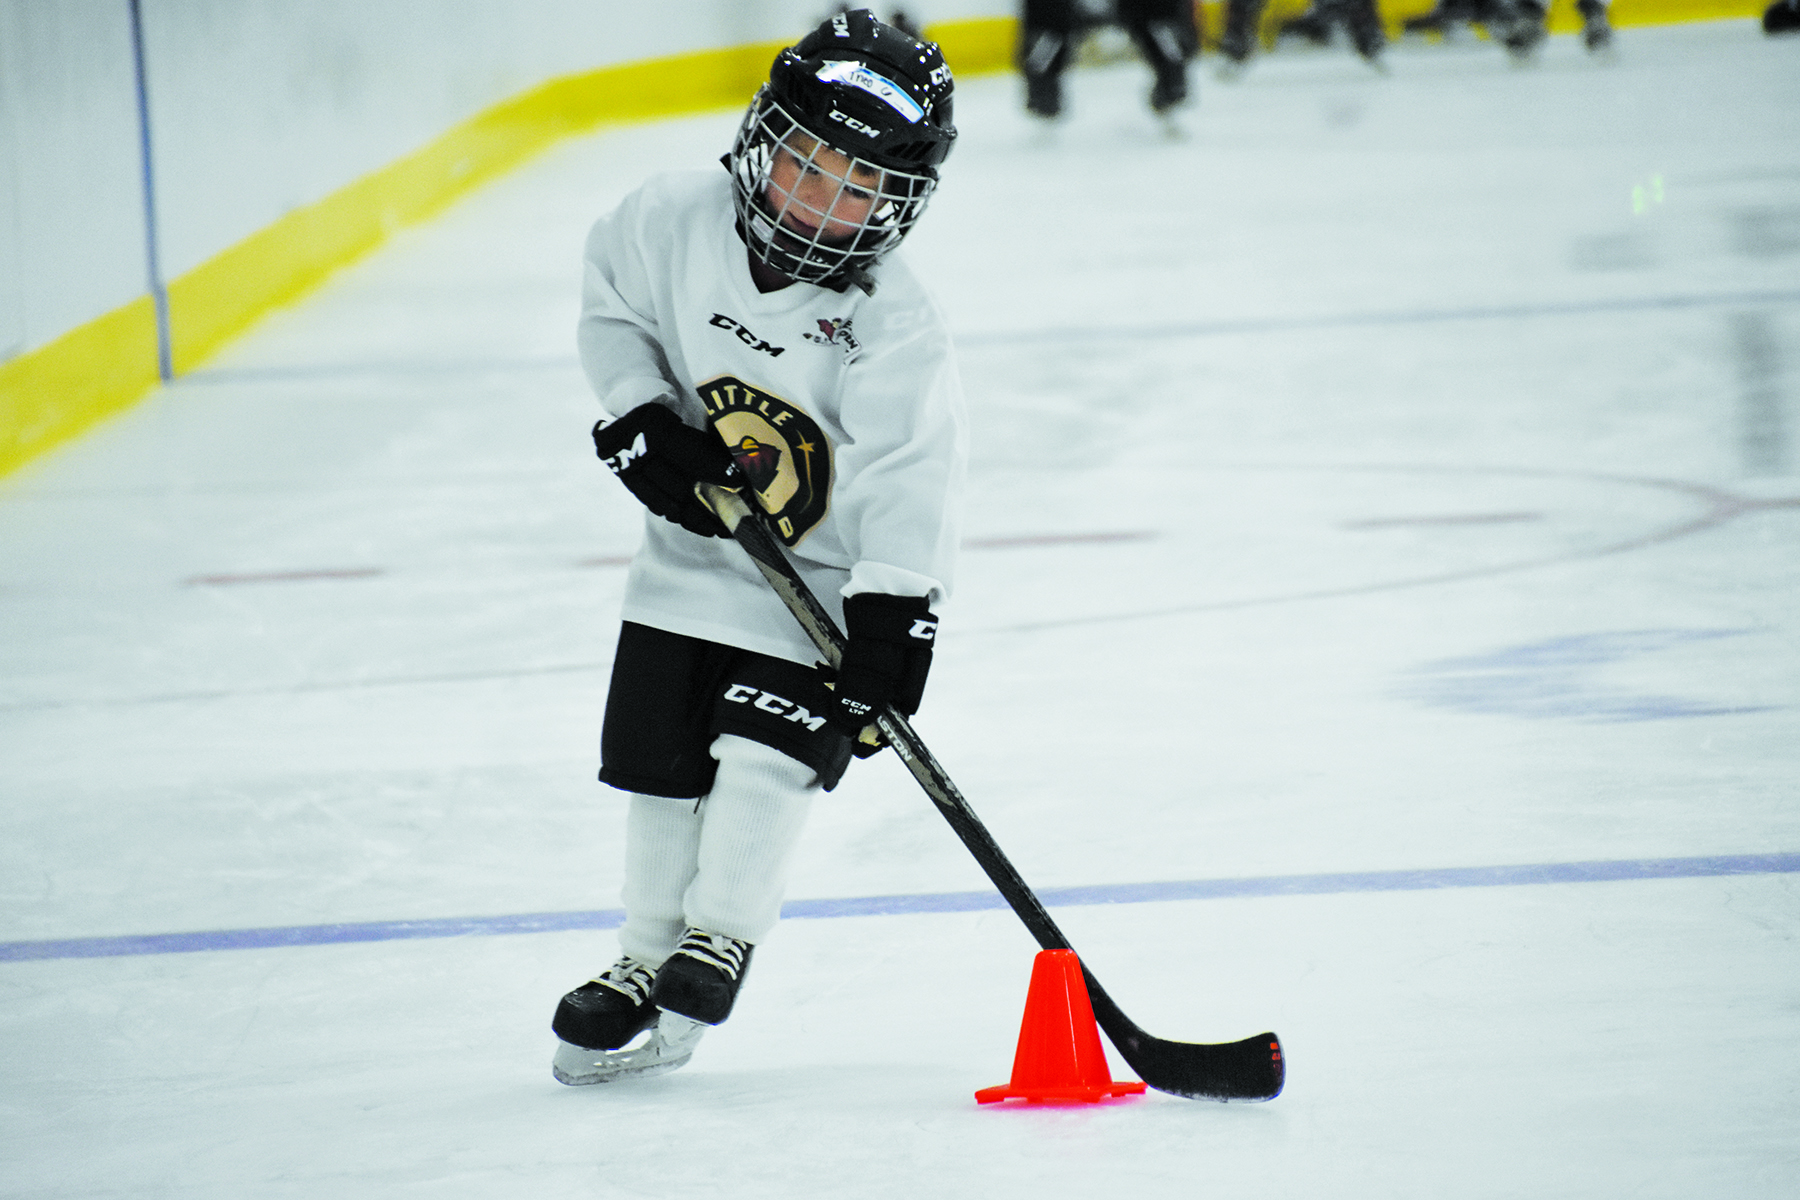 YOUTH HOCKEY: Registration still open for Little Minnesota Wild ...